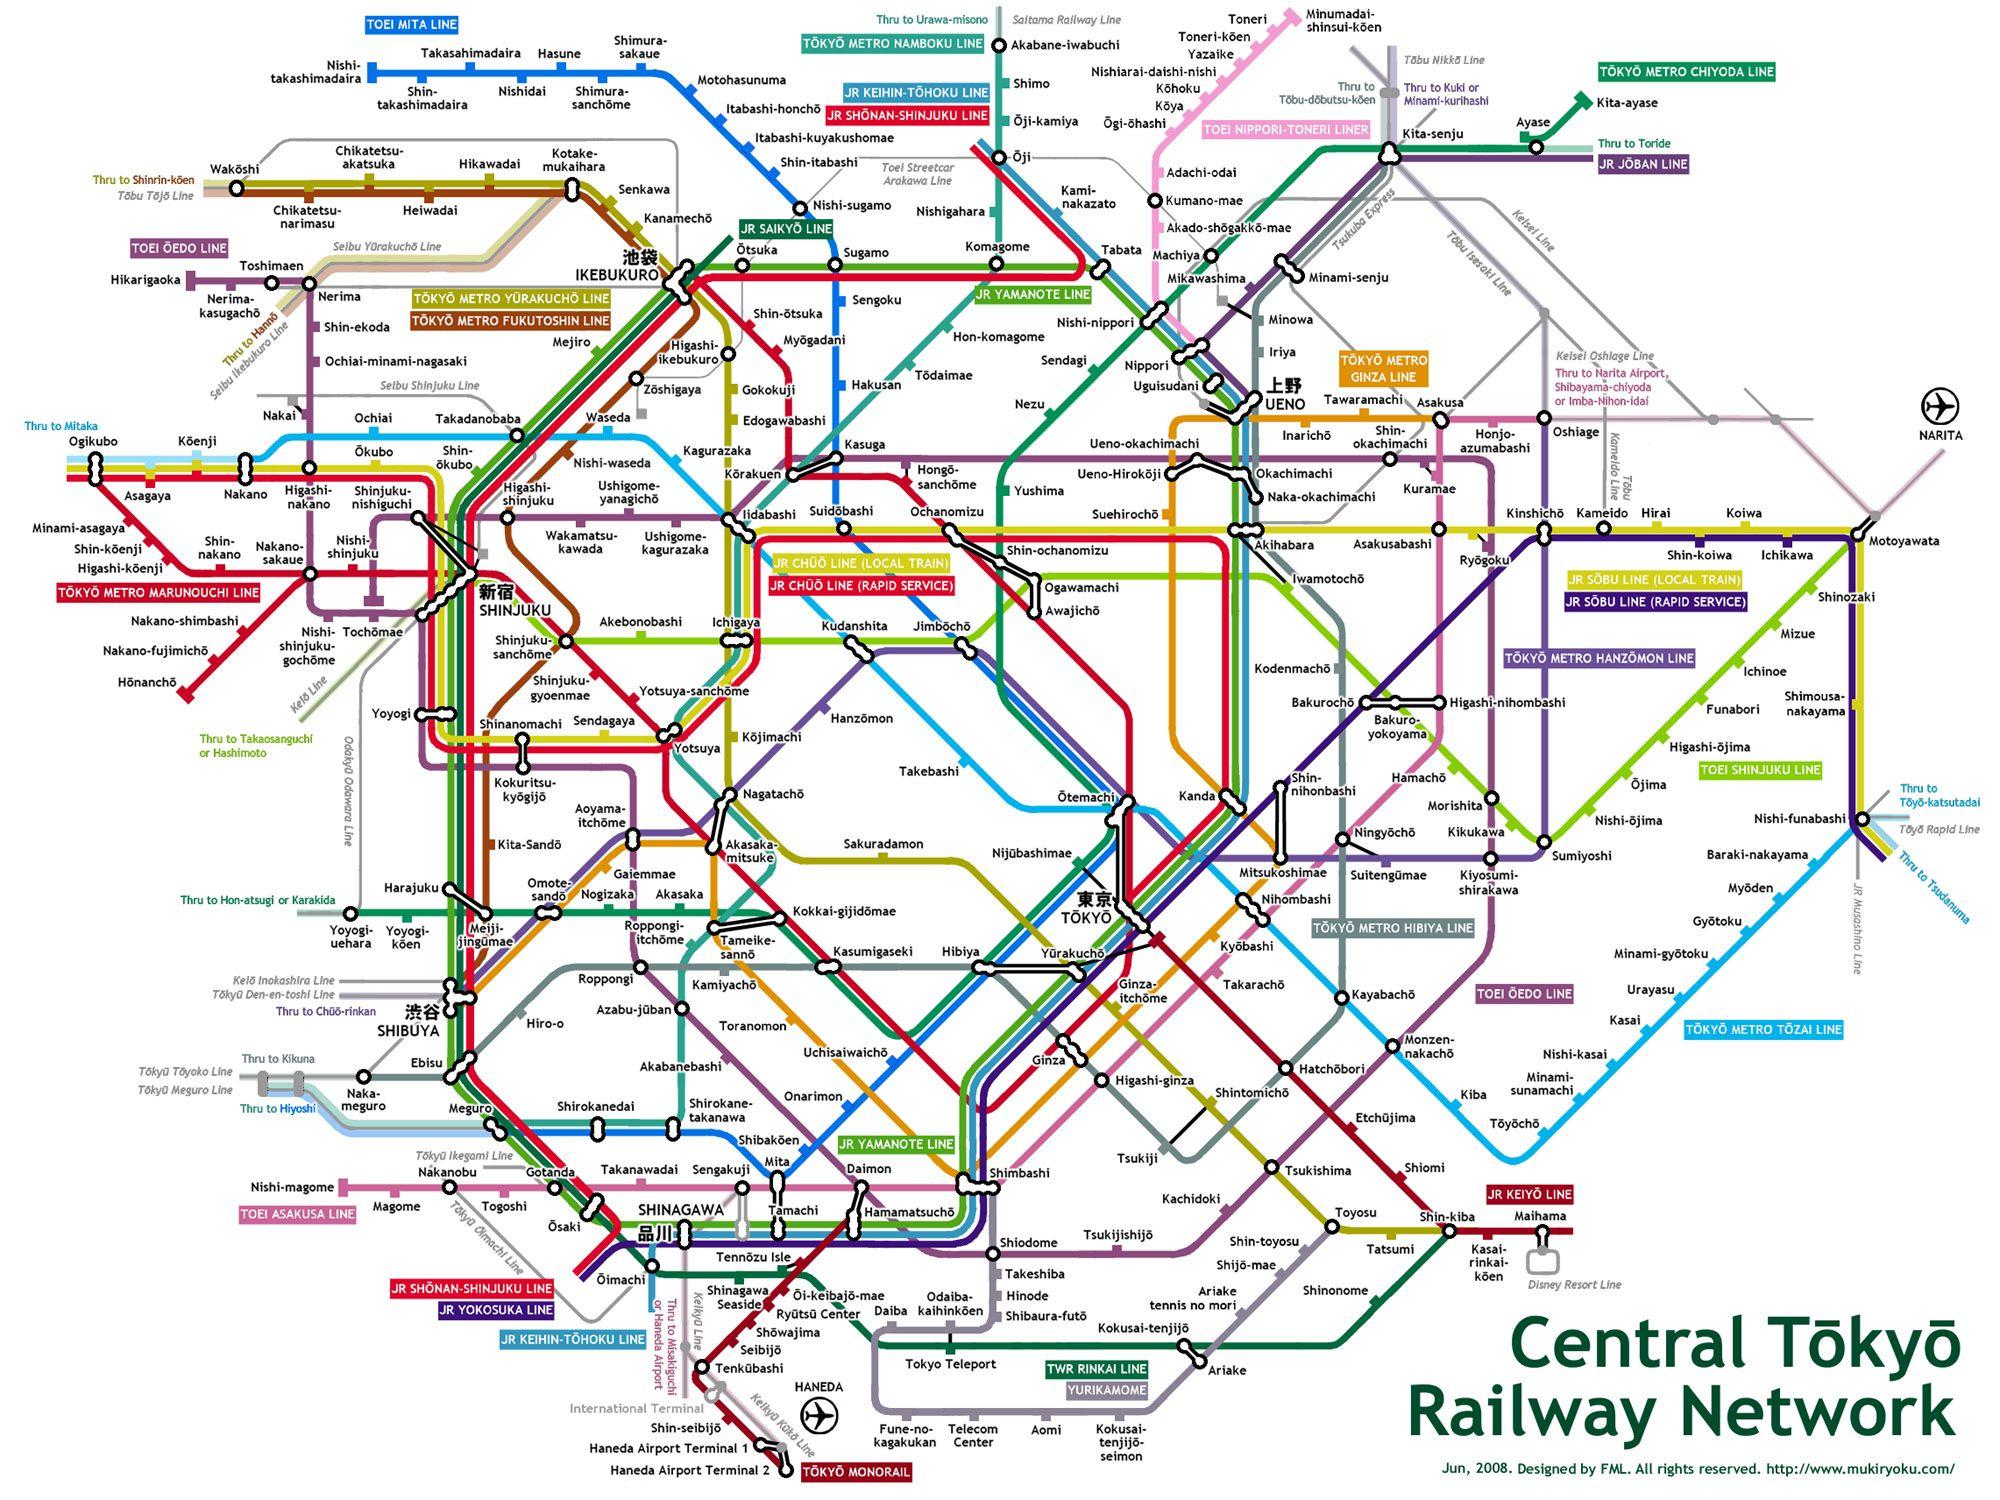 tokyosubway Tokyo Metro Map Tokyo mappery Japan